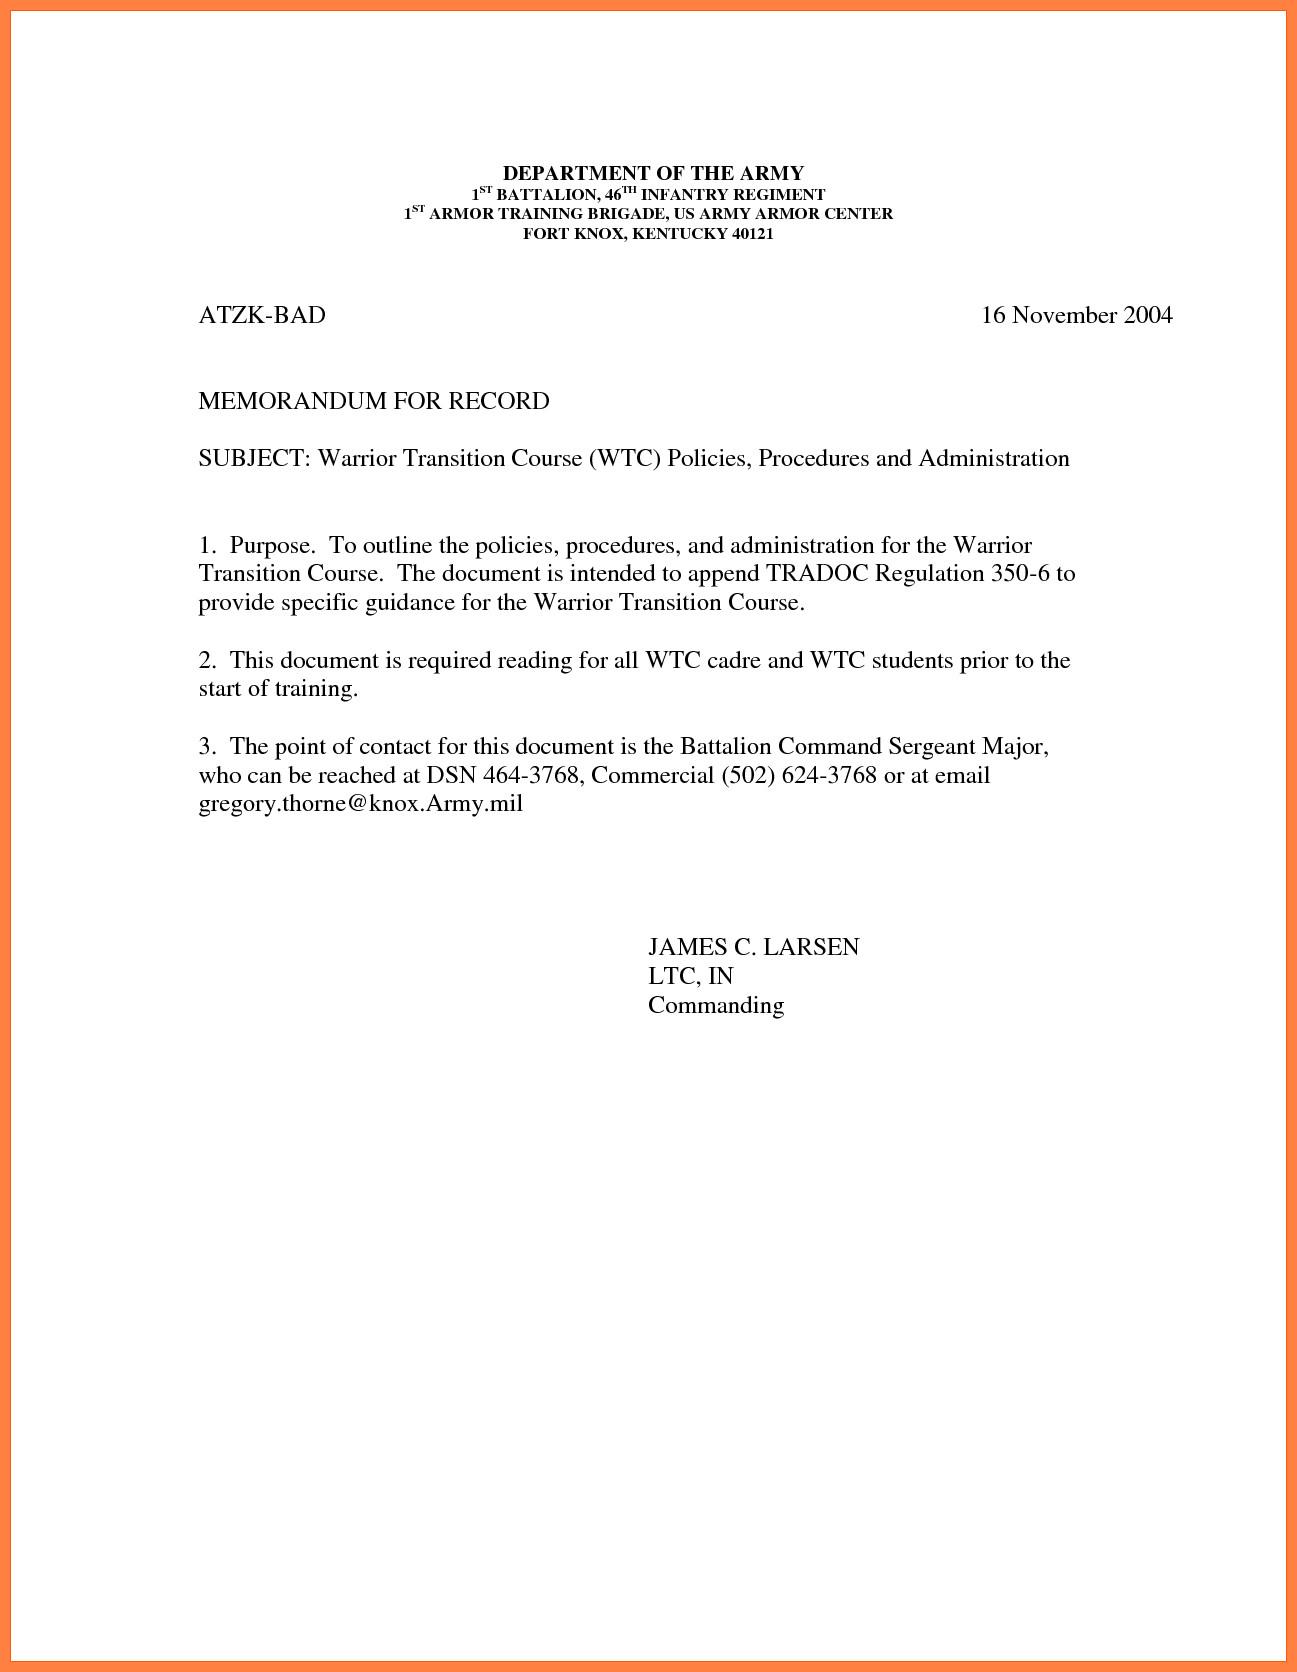 Memorandum for Record Army 9 Memorandum for Record Army